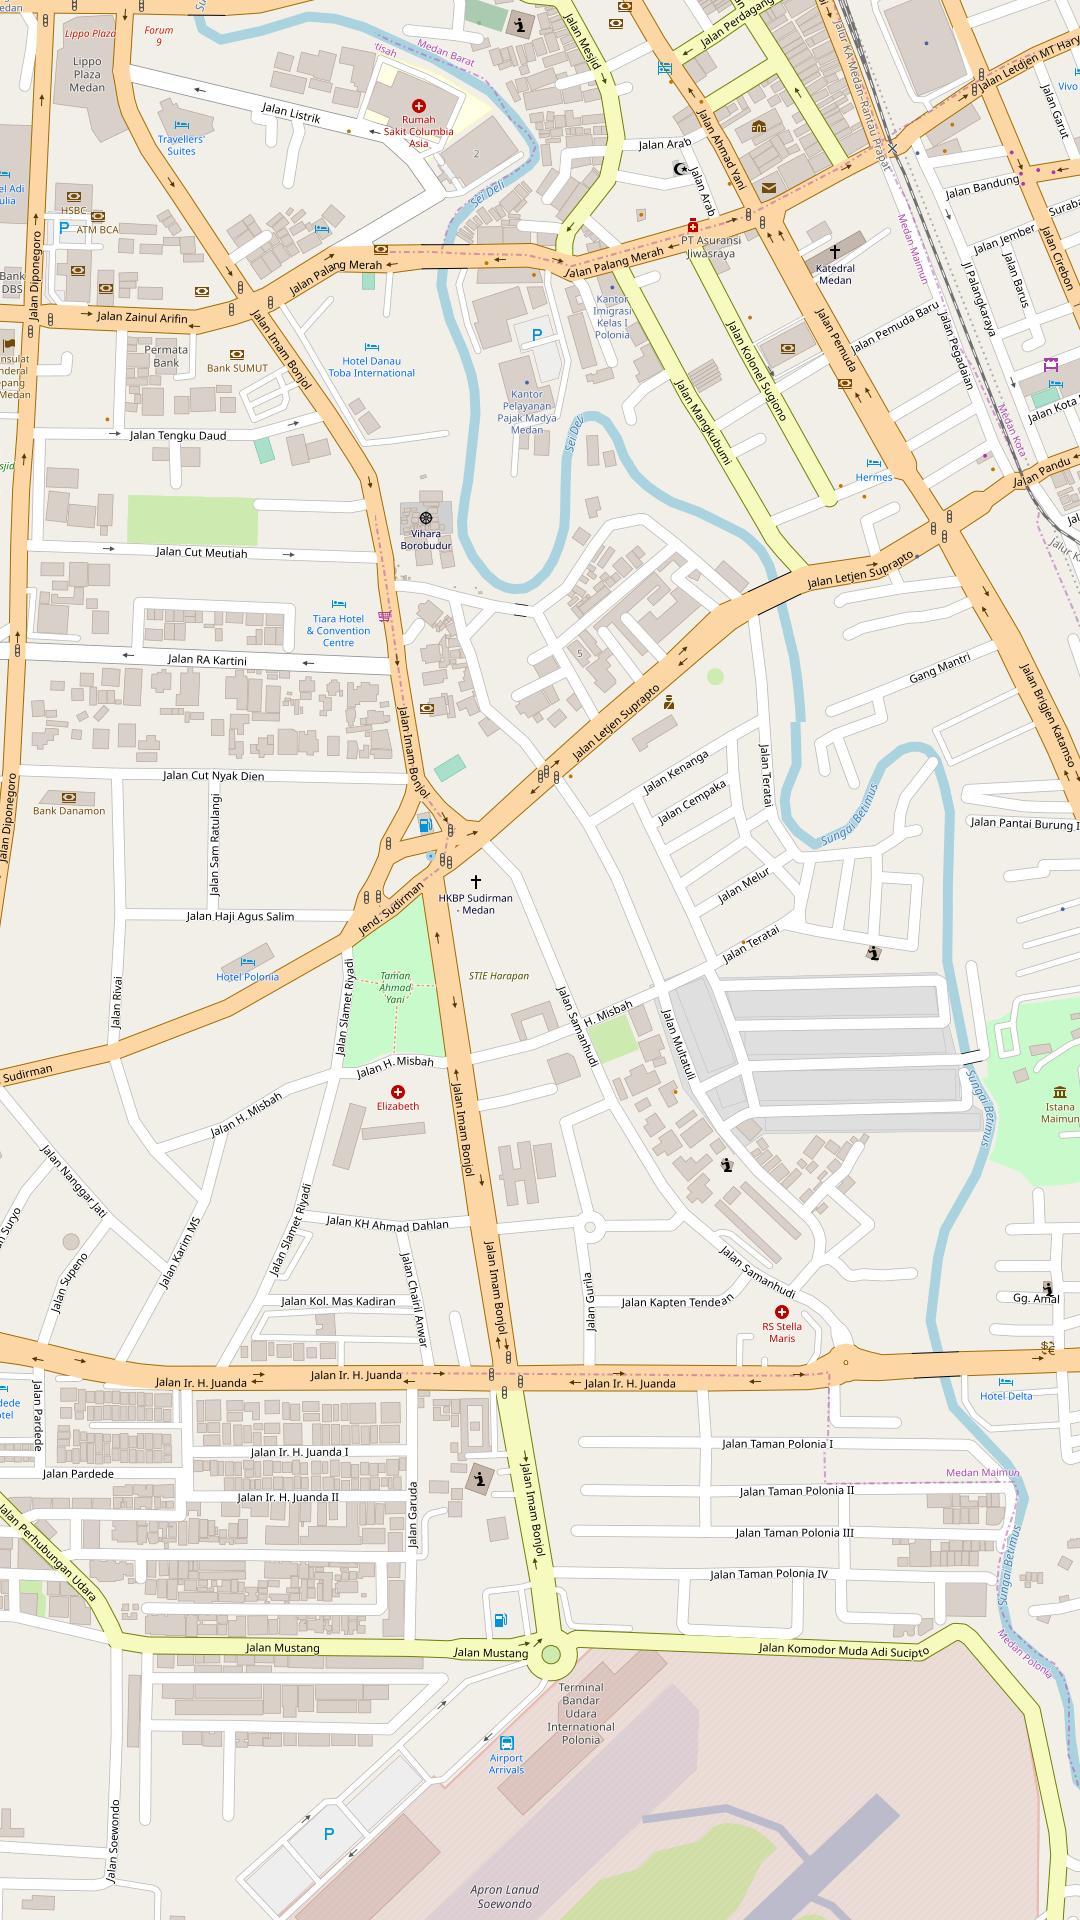 Medan Offline Map for Android - APK Download on hong kong map, padang map, balikpapan map, shah alam map, cebu map, borneo map, kabul map, baku map, indonesia map, bandar seri begawan map, east java map, palembang map, south jakarta map, pekanbaru map, rio de janeiro map, recife map, natal map, mandalay map, yogyakarta map, semarang map,